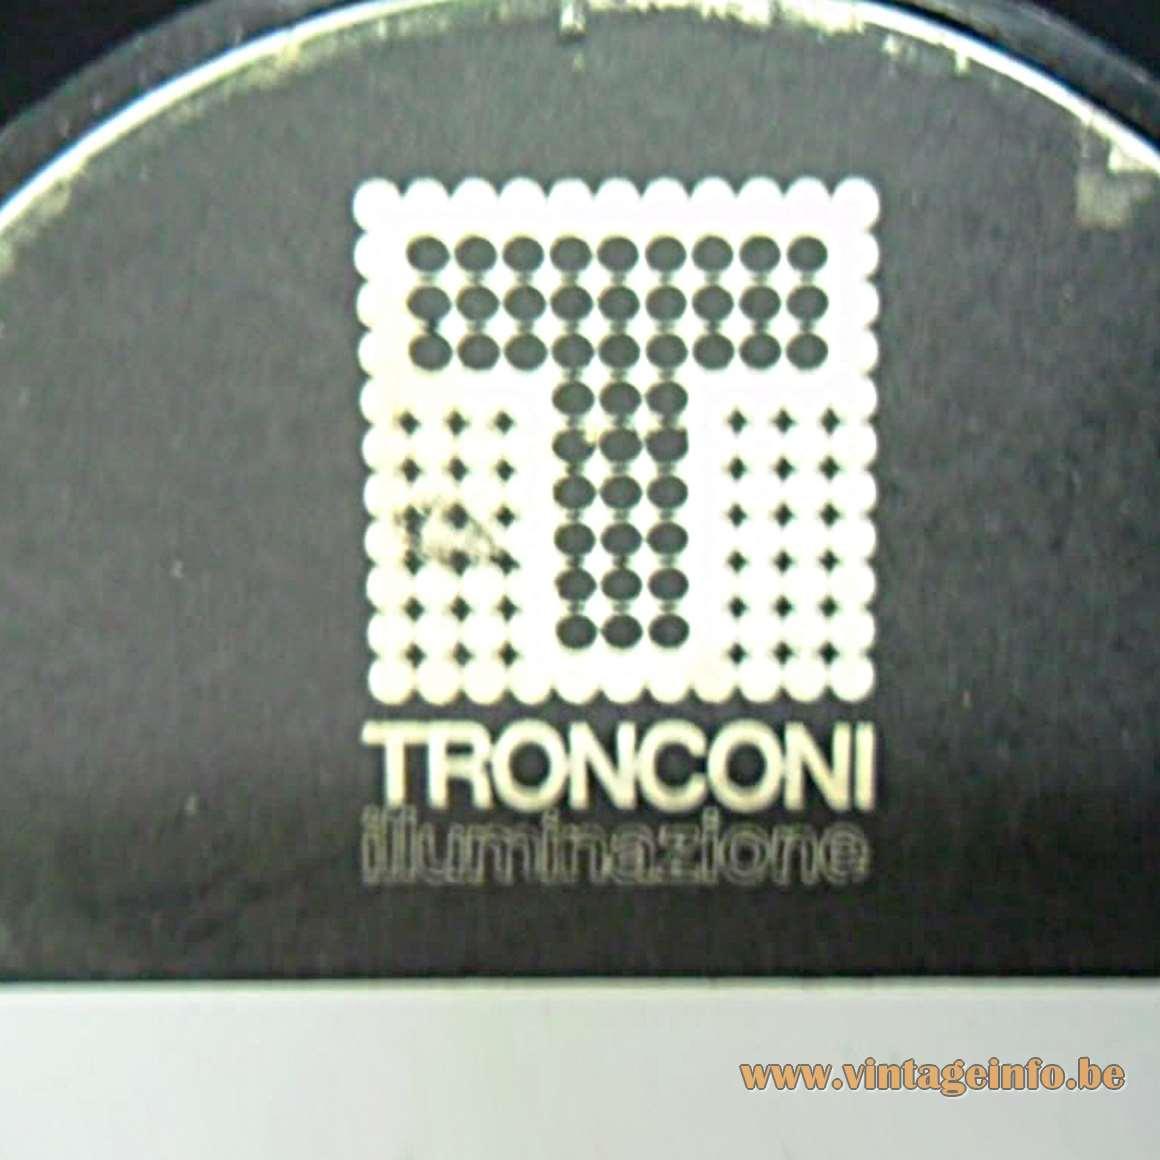 Yamada Shomei Manon Table Lamp - Tronconi